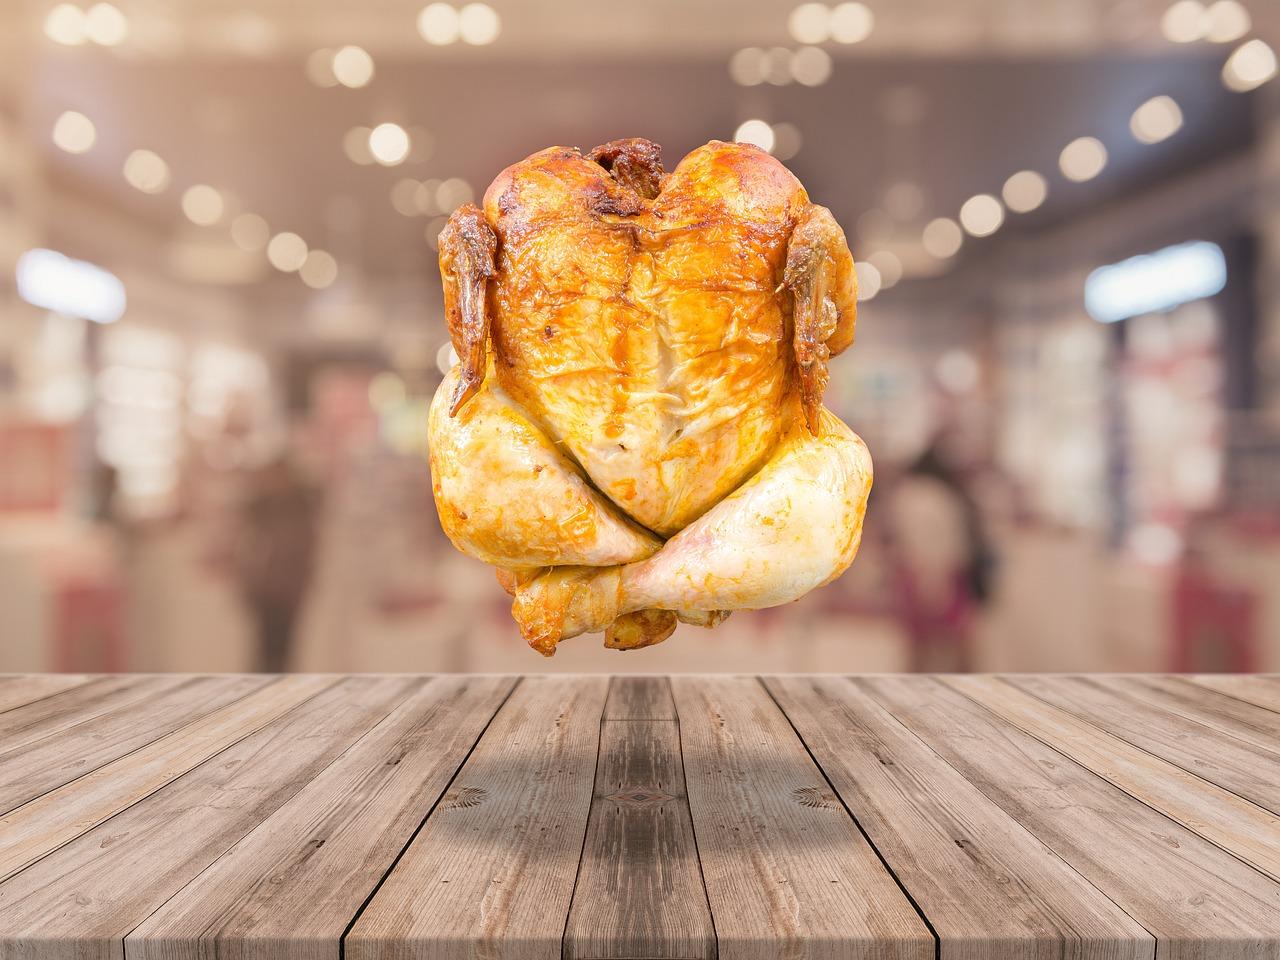 Recipes that'll make you the Thanksgiving MVP methodshop via Pixabay